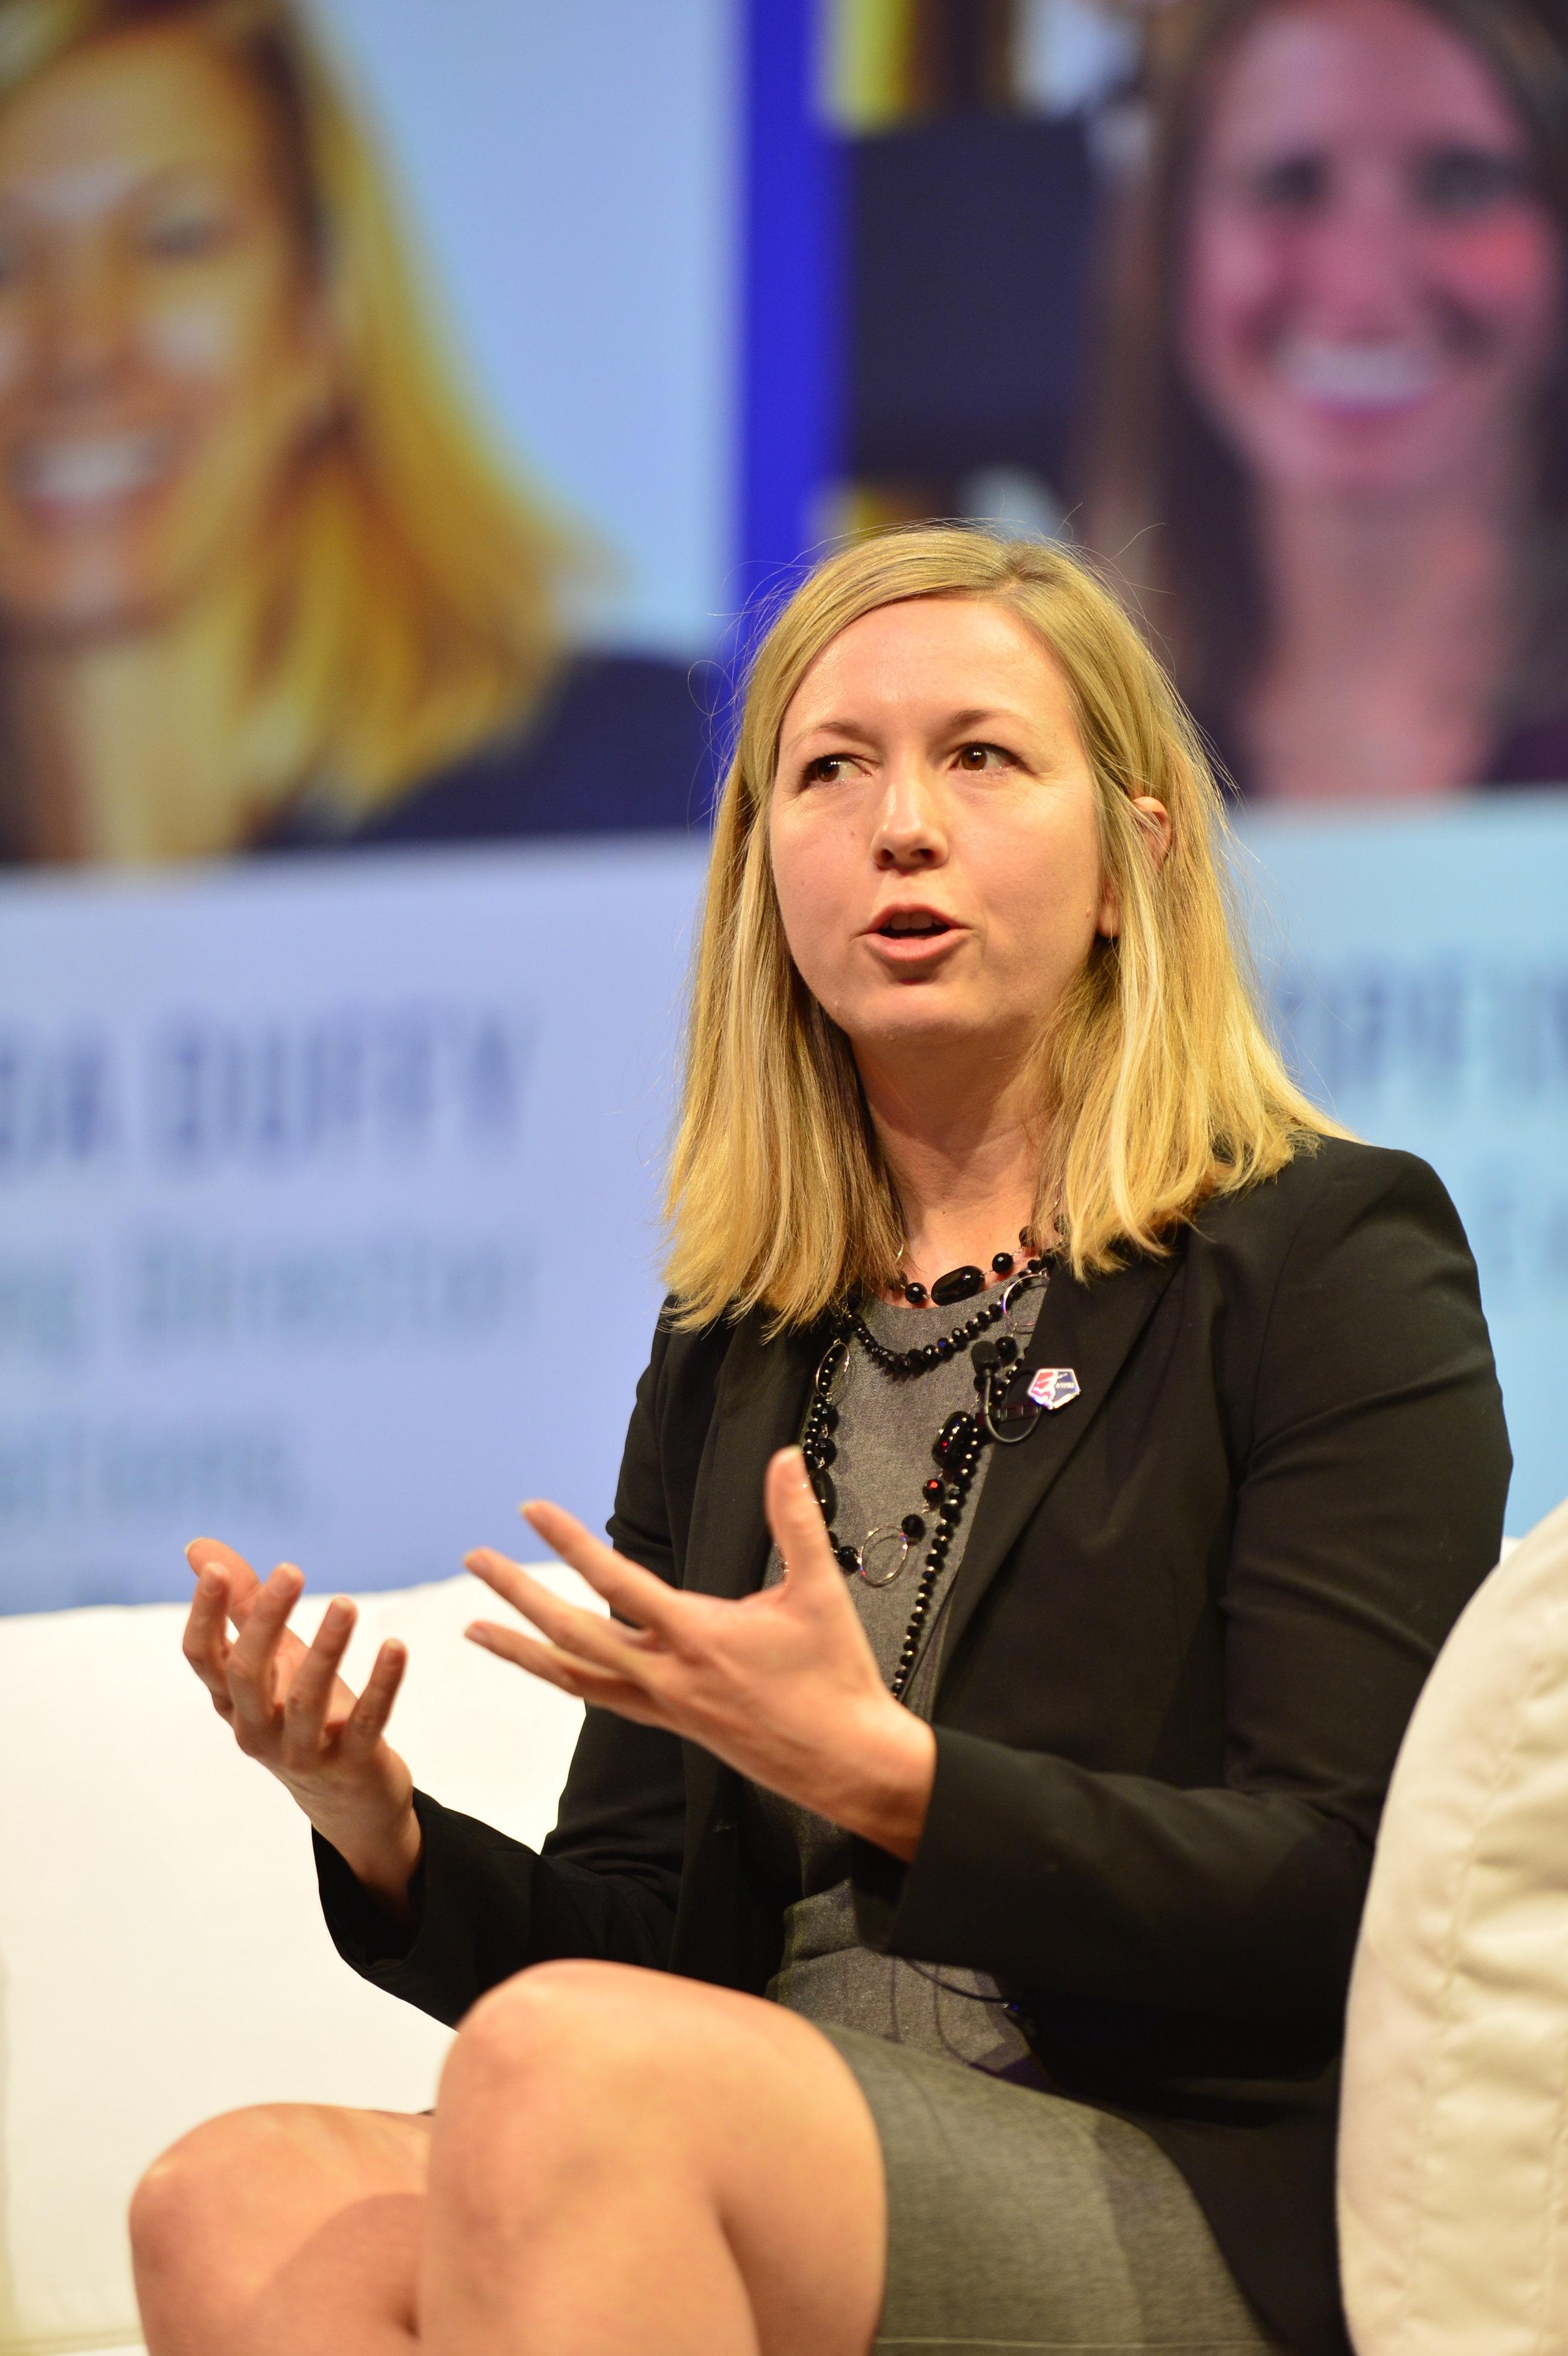 Amanda Duffy - Managing Director of Operations, NWSL